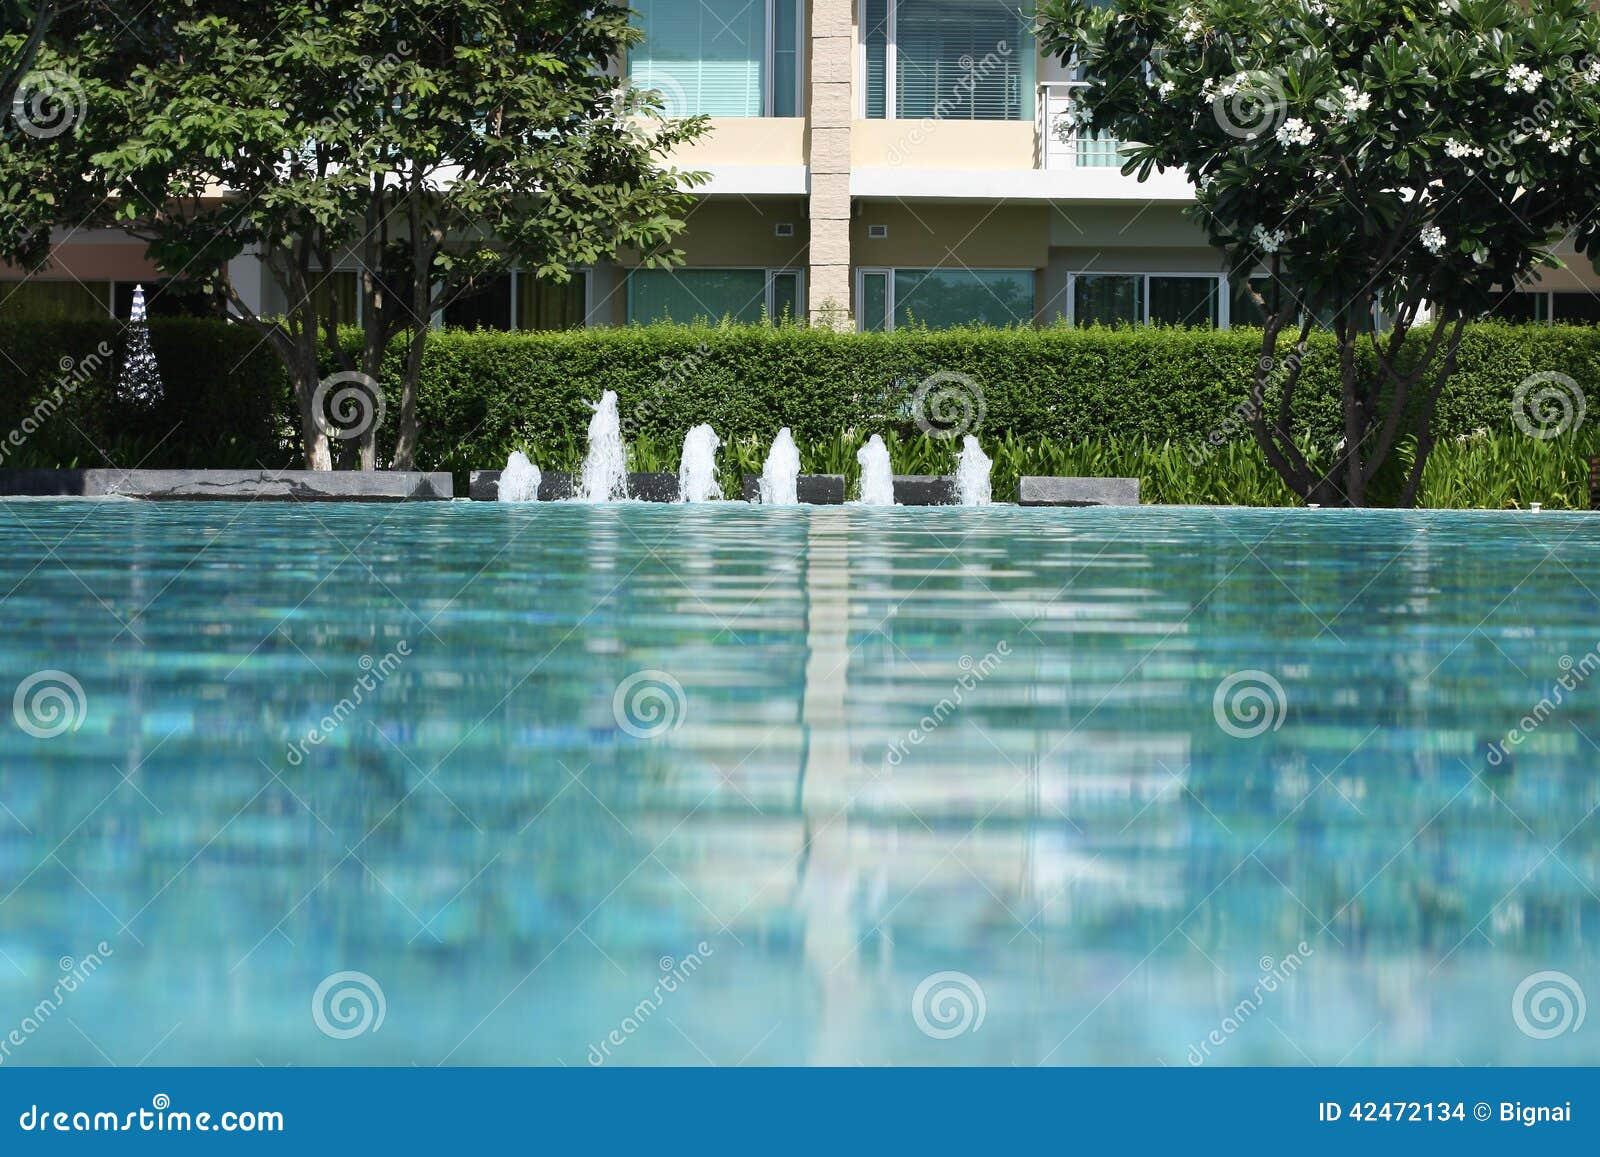 Swimmingpool und Garten